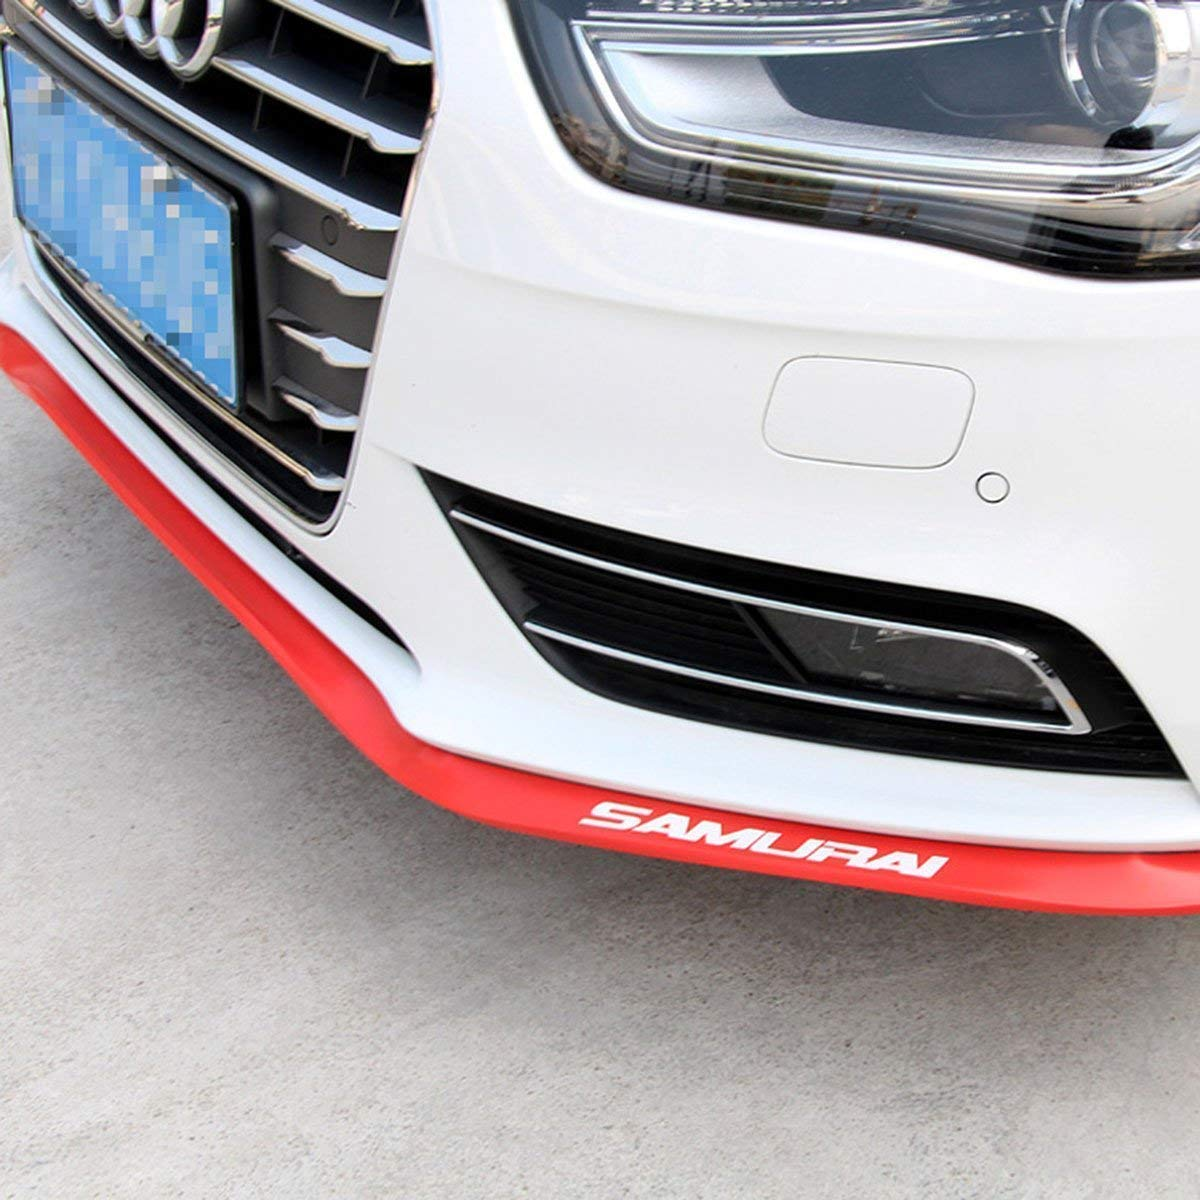 Front Lip ,HengJia Auto Parts 2.5m/8.2ft Car carbon fiber front lip,Front Bumper Lip ,Carbon Lip ,Side Skirt, front lip spoiler 100% waterproof protection( Red)